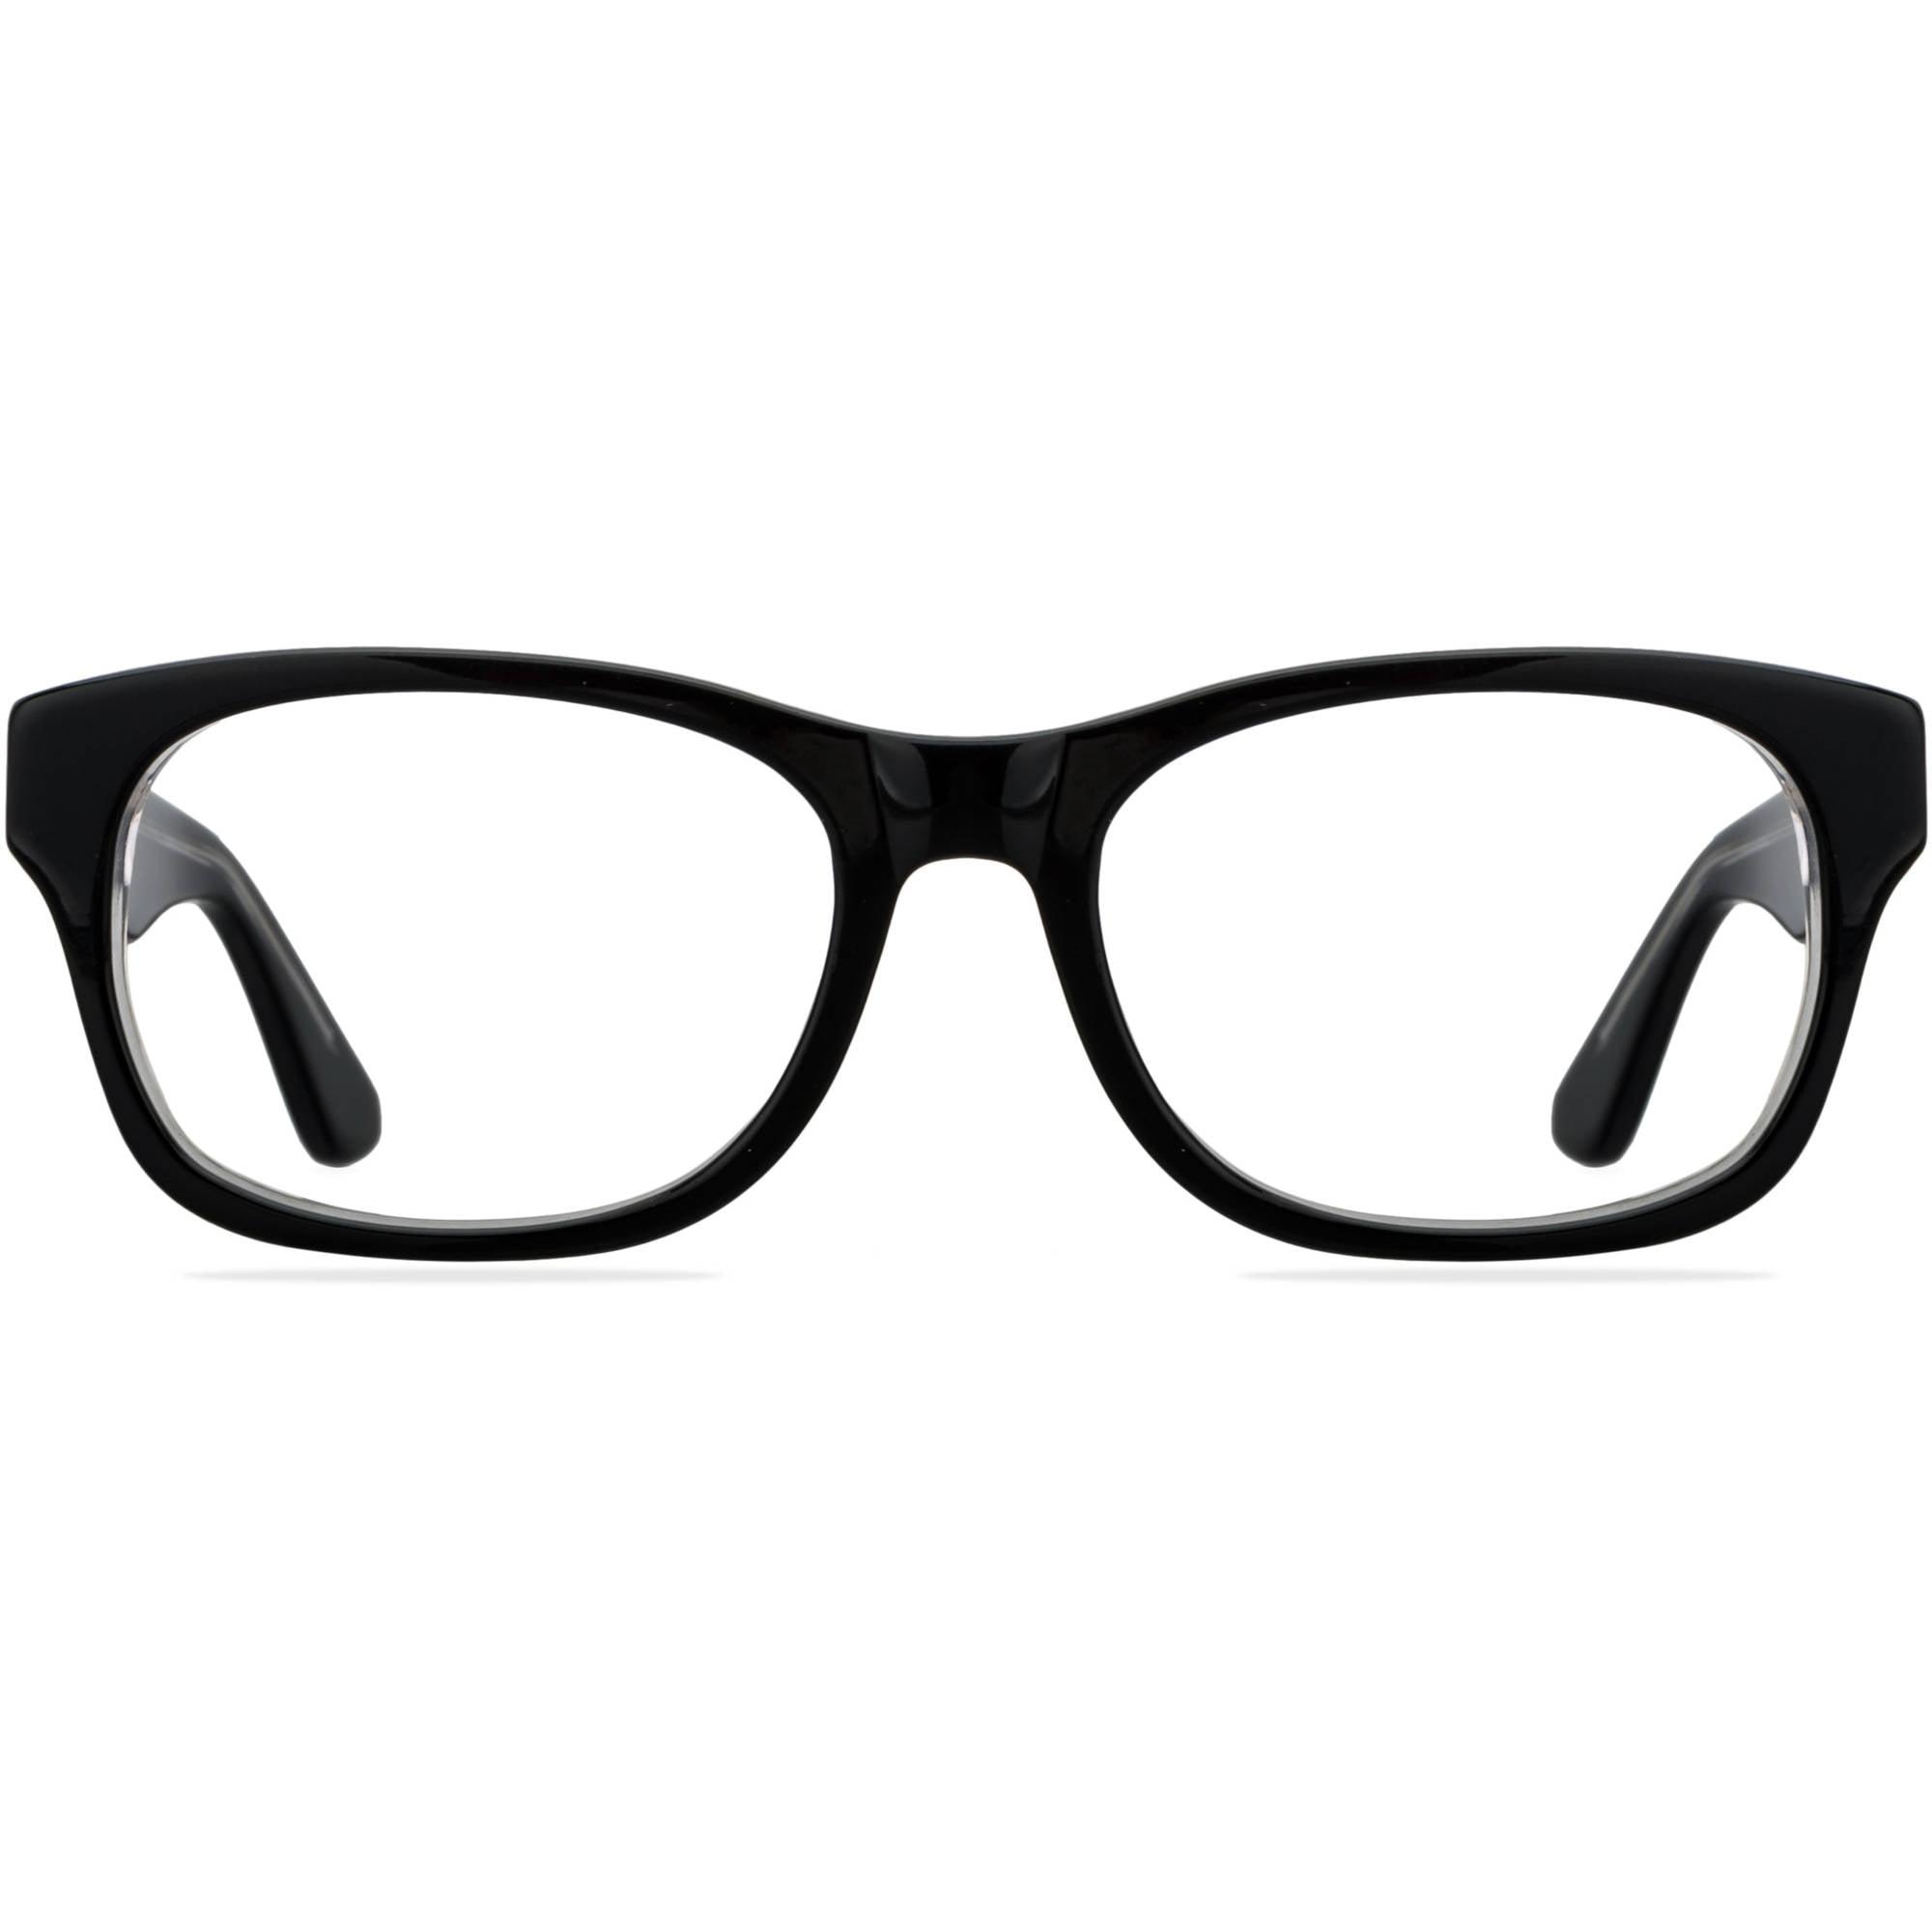 Frame glasses calvin klein - Frames Glasses Vogue Contour Youths Prescription Glasses Fm14104 Black Crystal Walmart Com